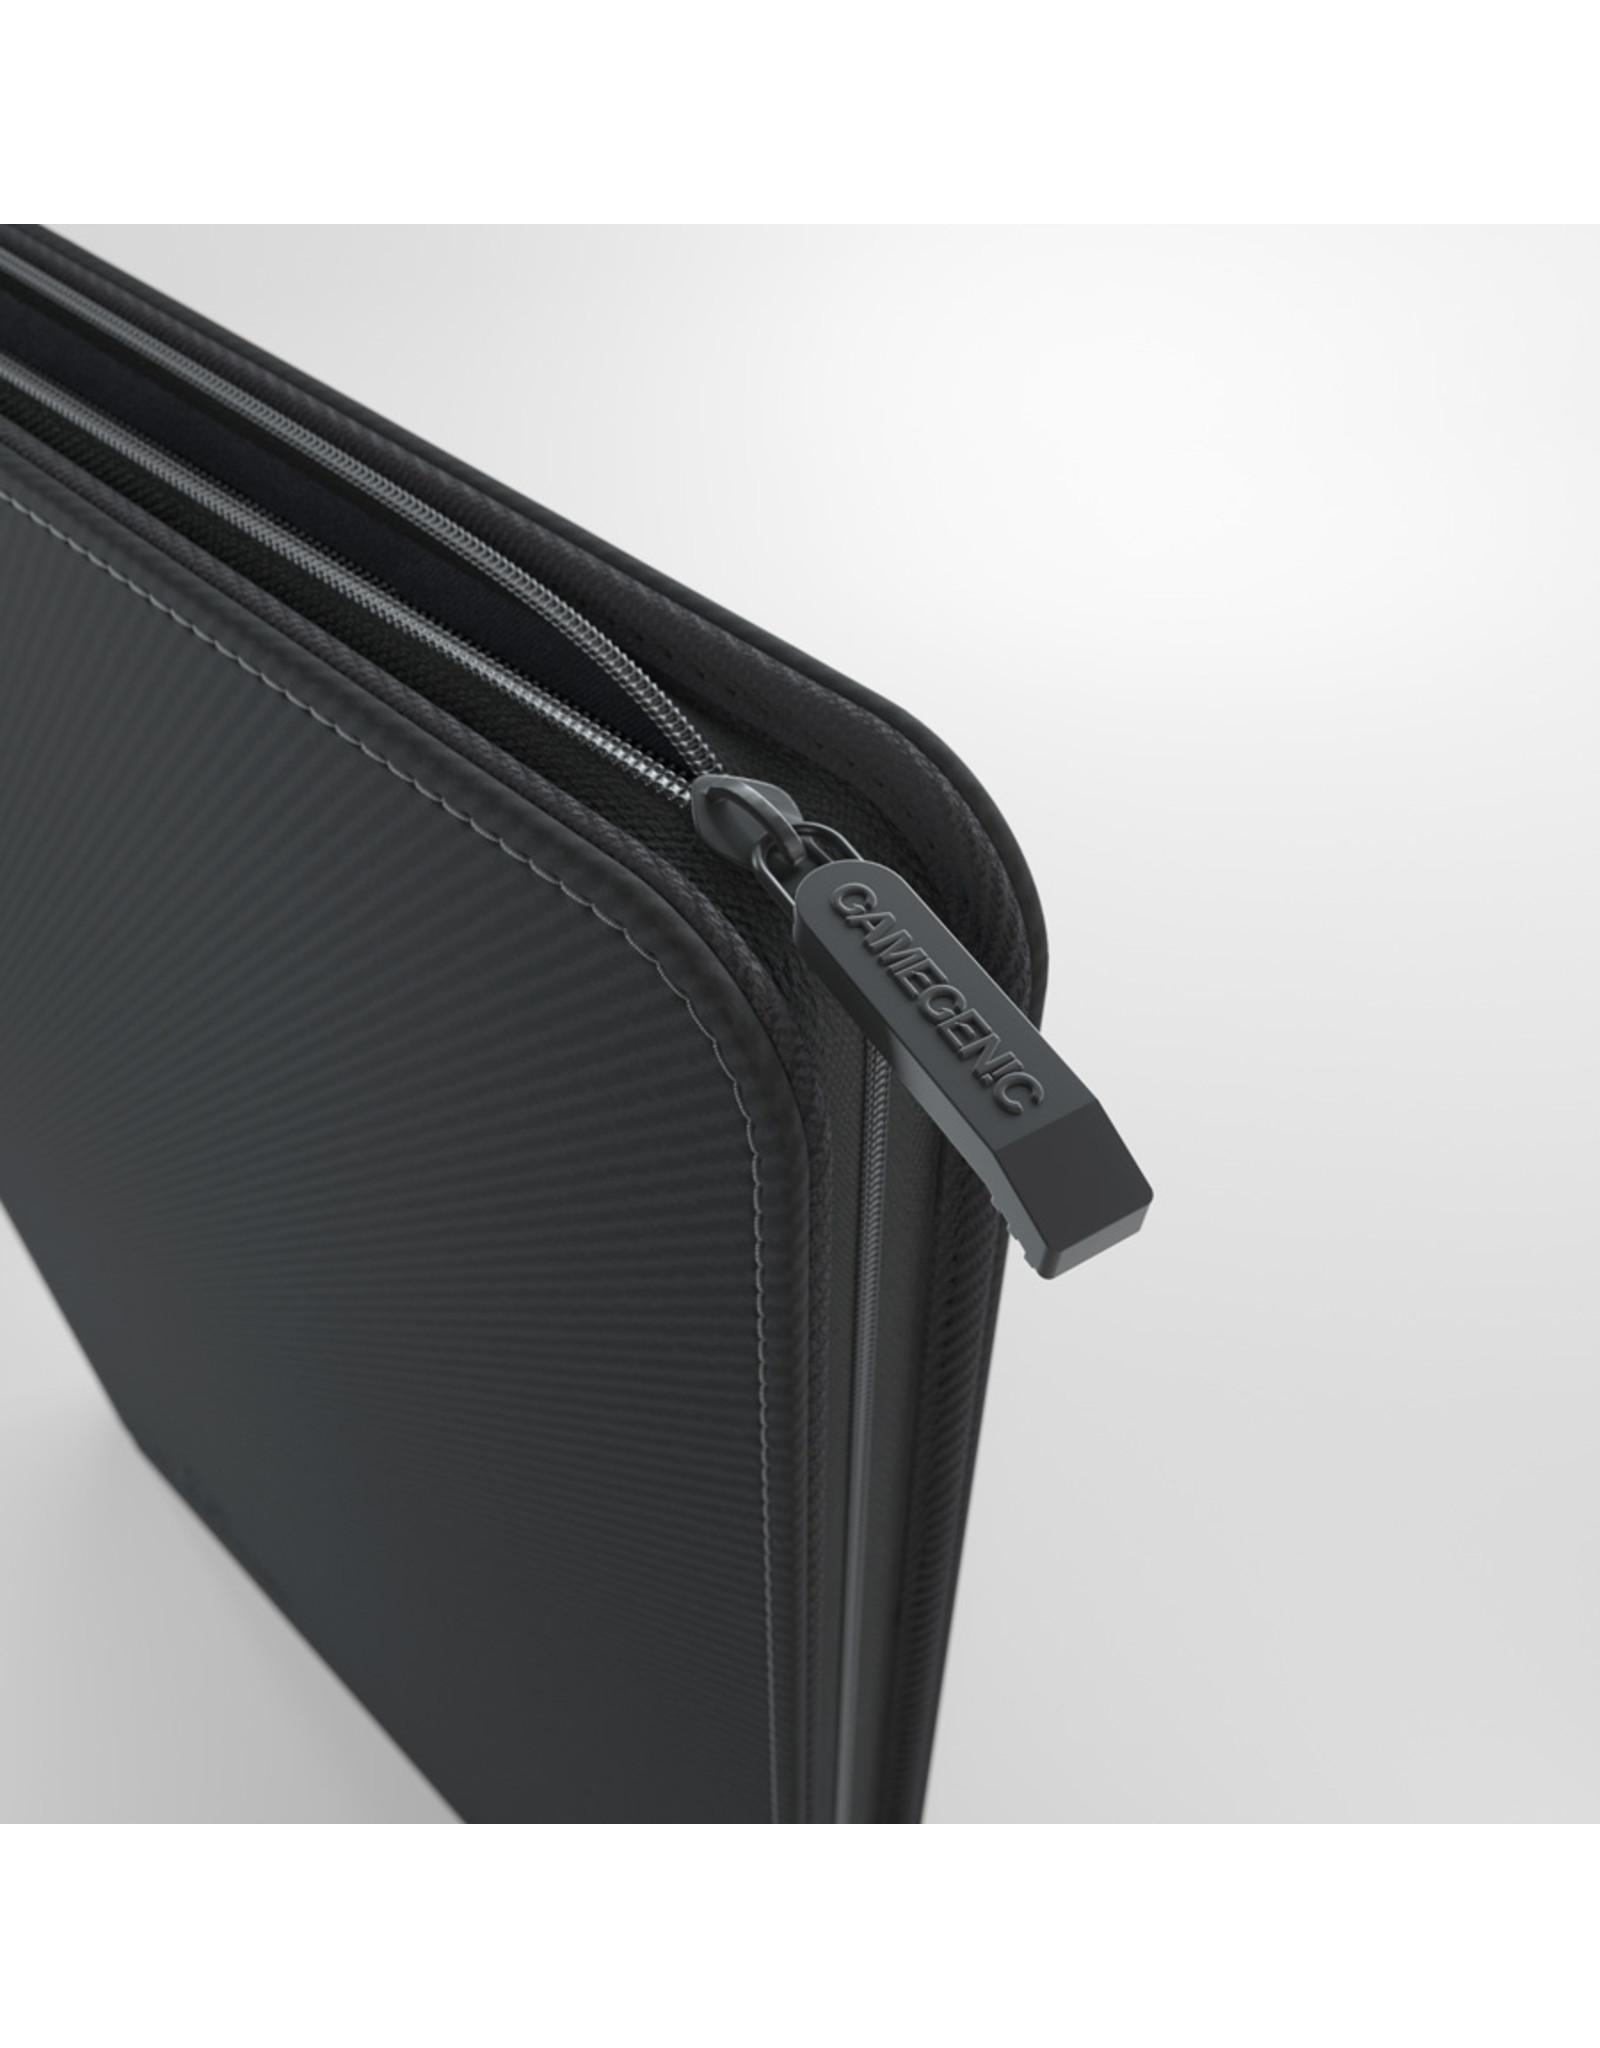 GAMEGENIC GAMEGENIC - Zip-Up Ring-Binder Slim